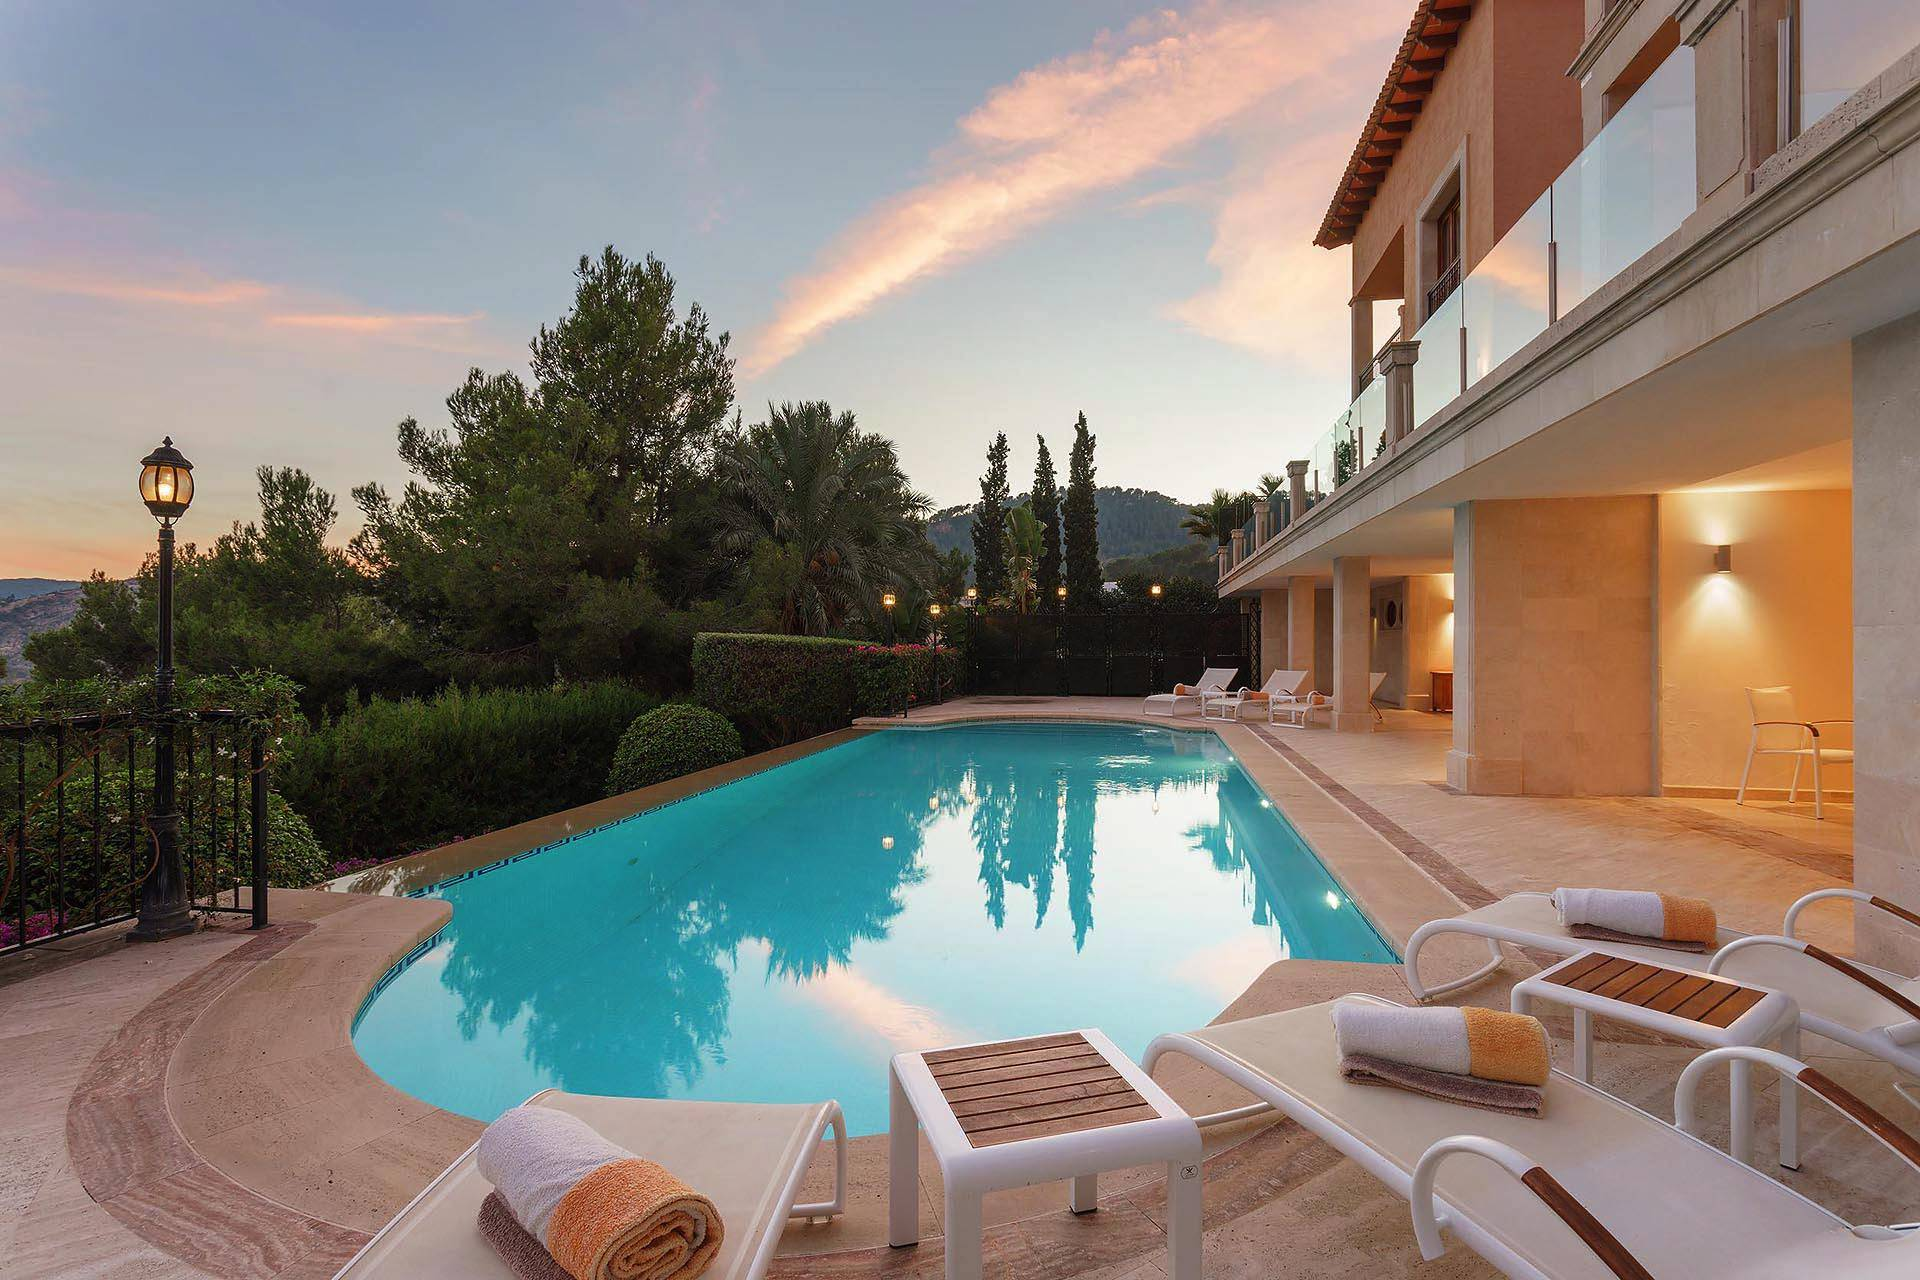 01-280 großzügige Villa nahe Palma de Mallorca Bild 13